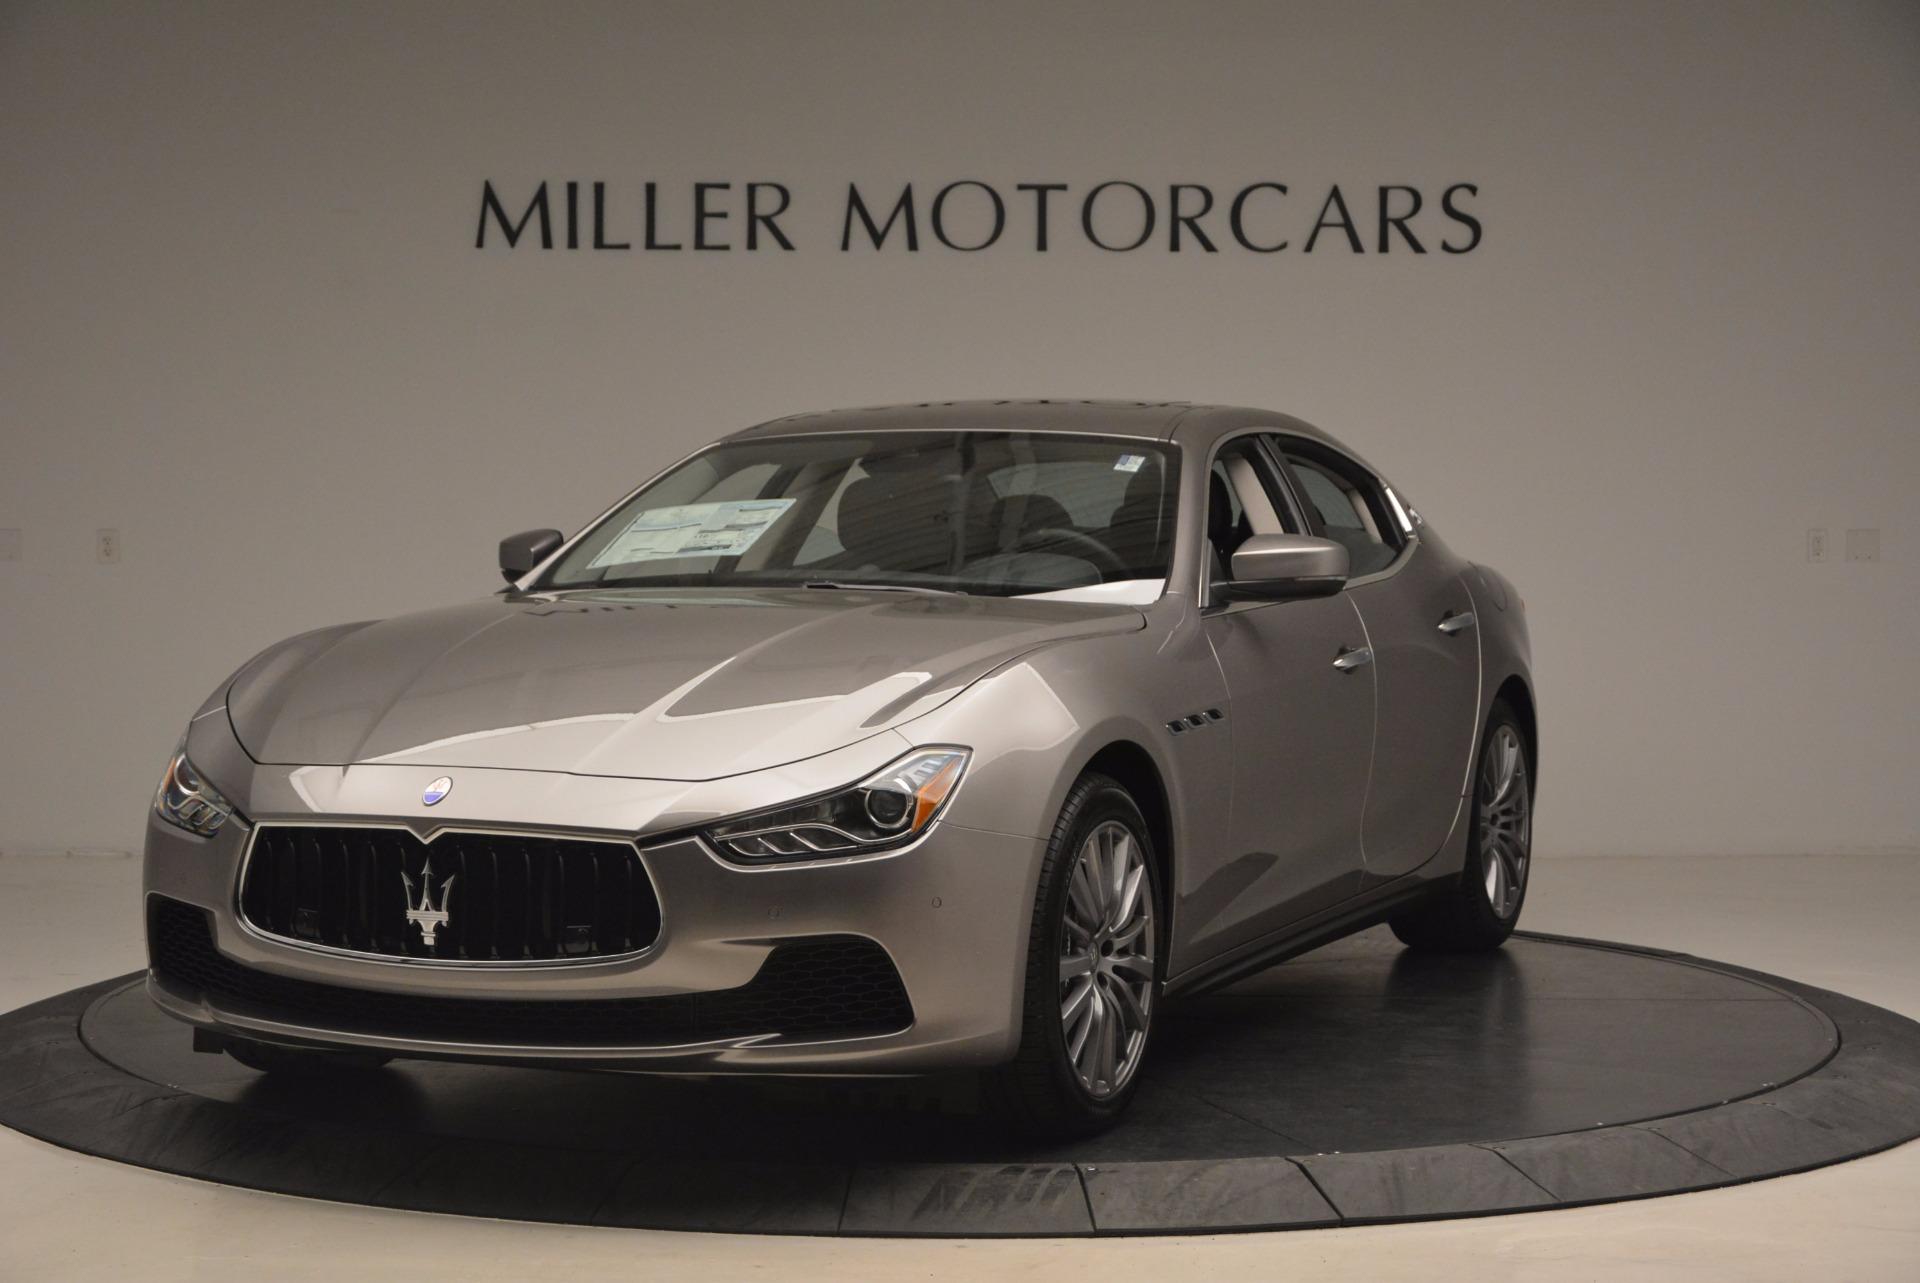 New 2017 Maserati Ghibli SQ4 for sale Sold at Pagani of Greenwich in Greenwich CT 06830 1